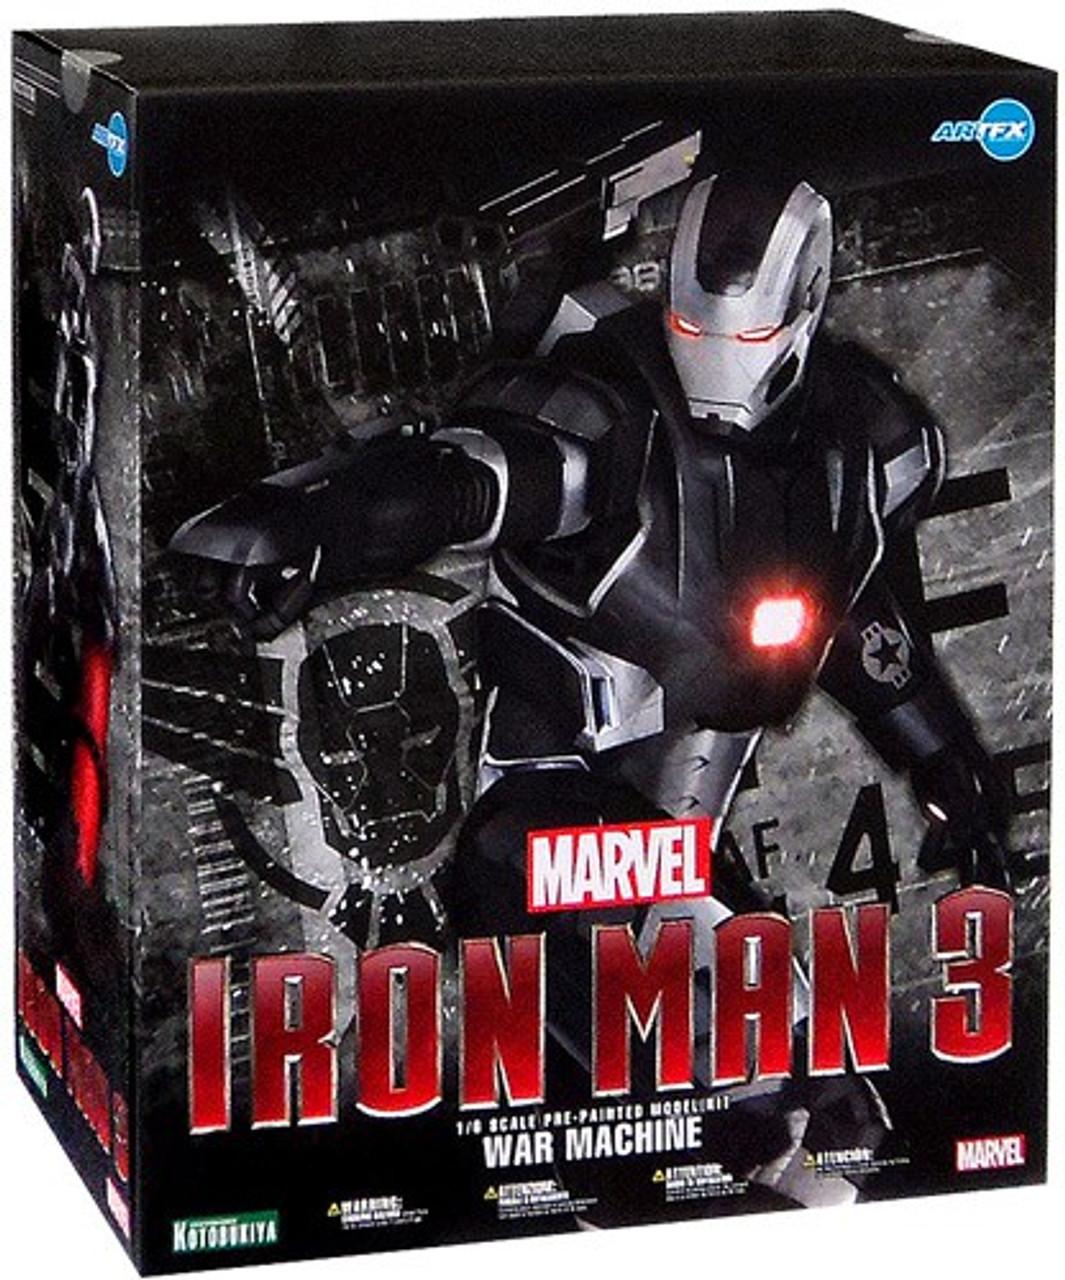 Roblox Iron Man How To Get War Machine Iron Man 3 Artfx War Machine 15 Fine Art Statue Kotobukiya Toywiz